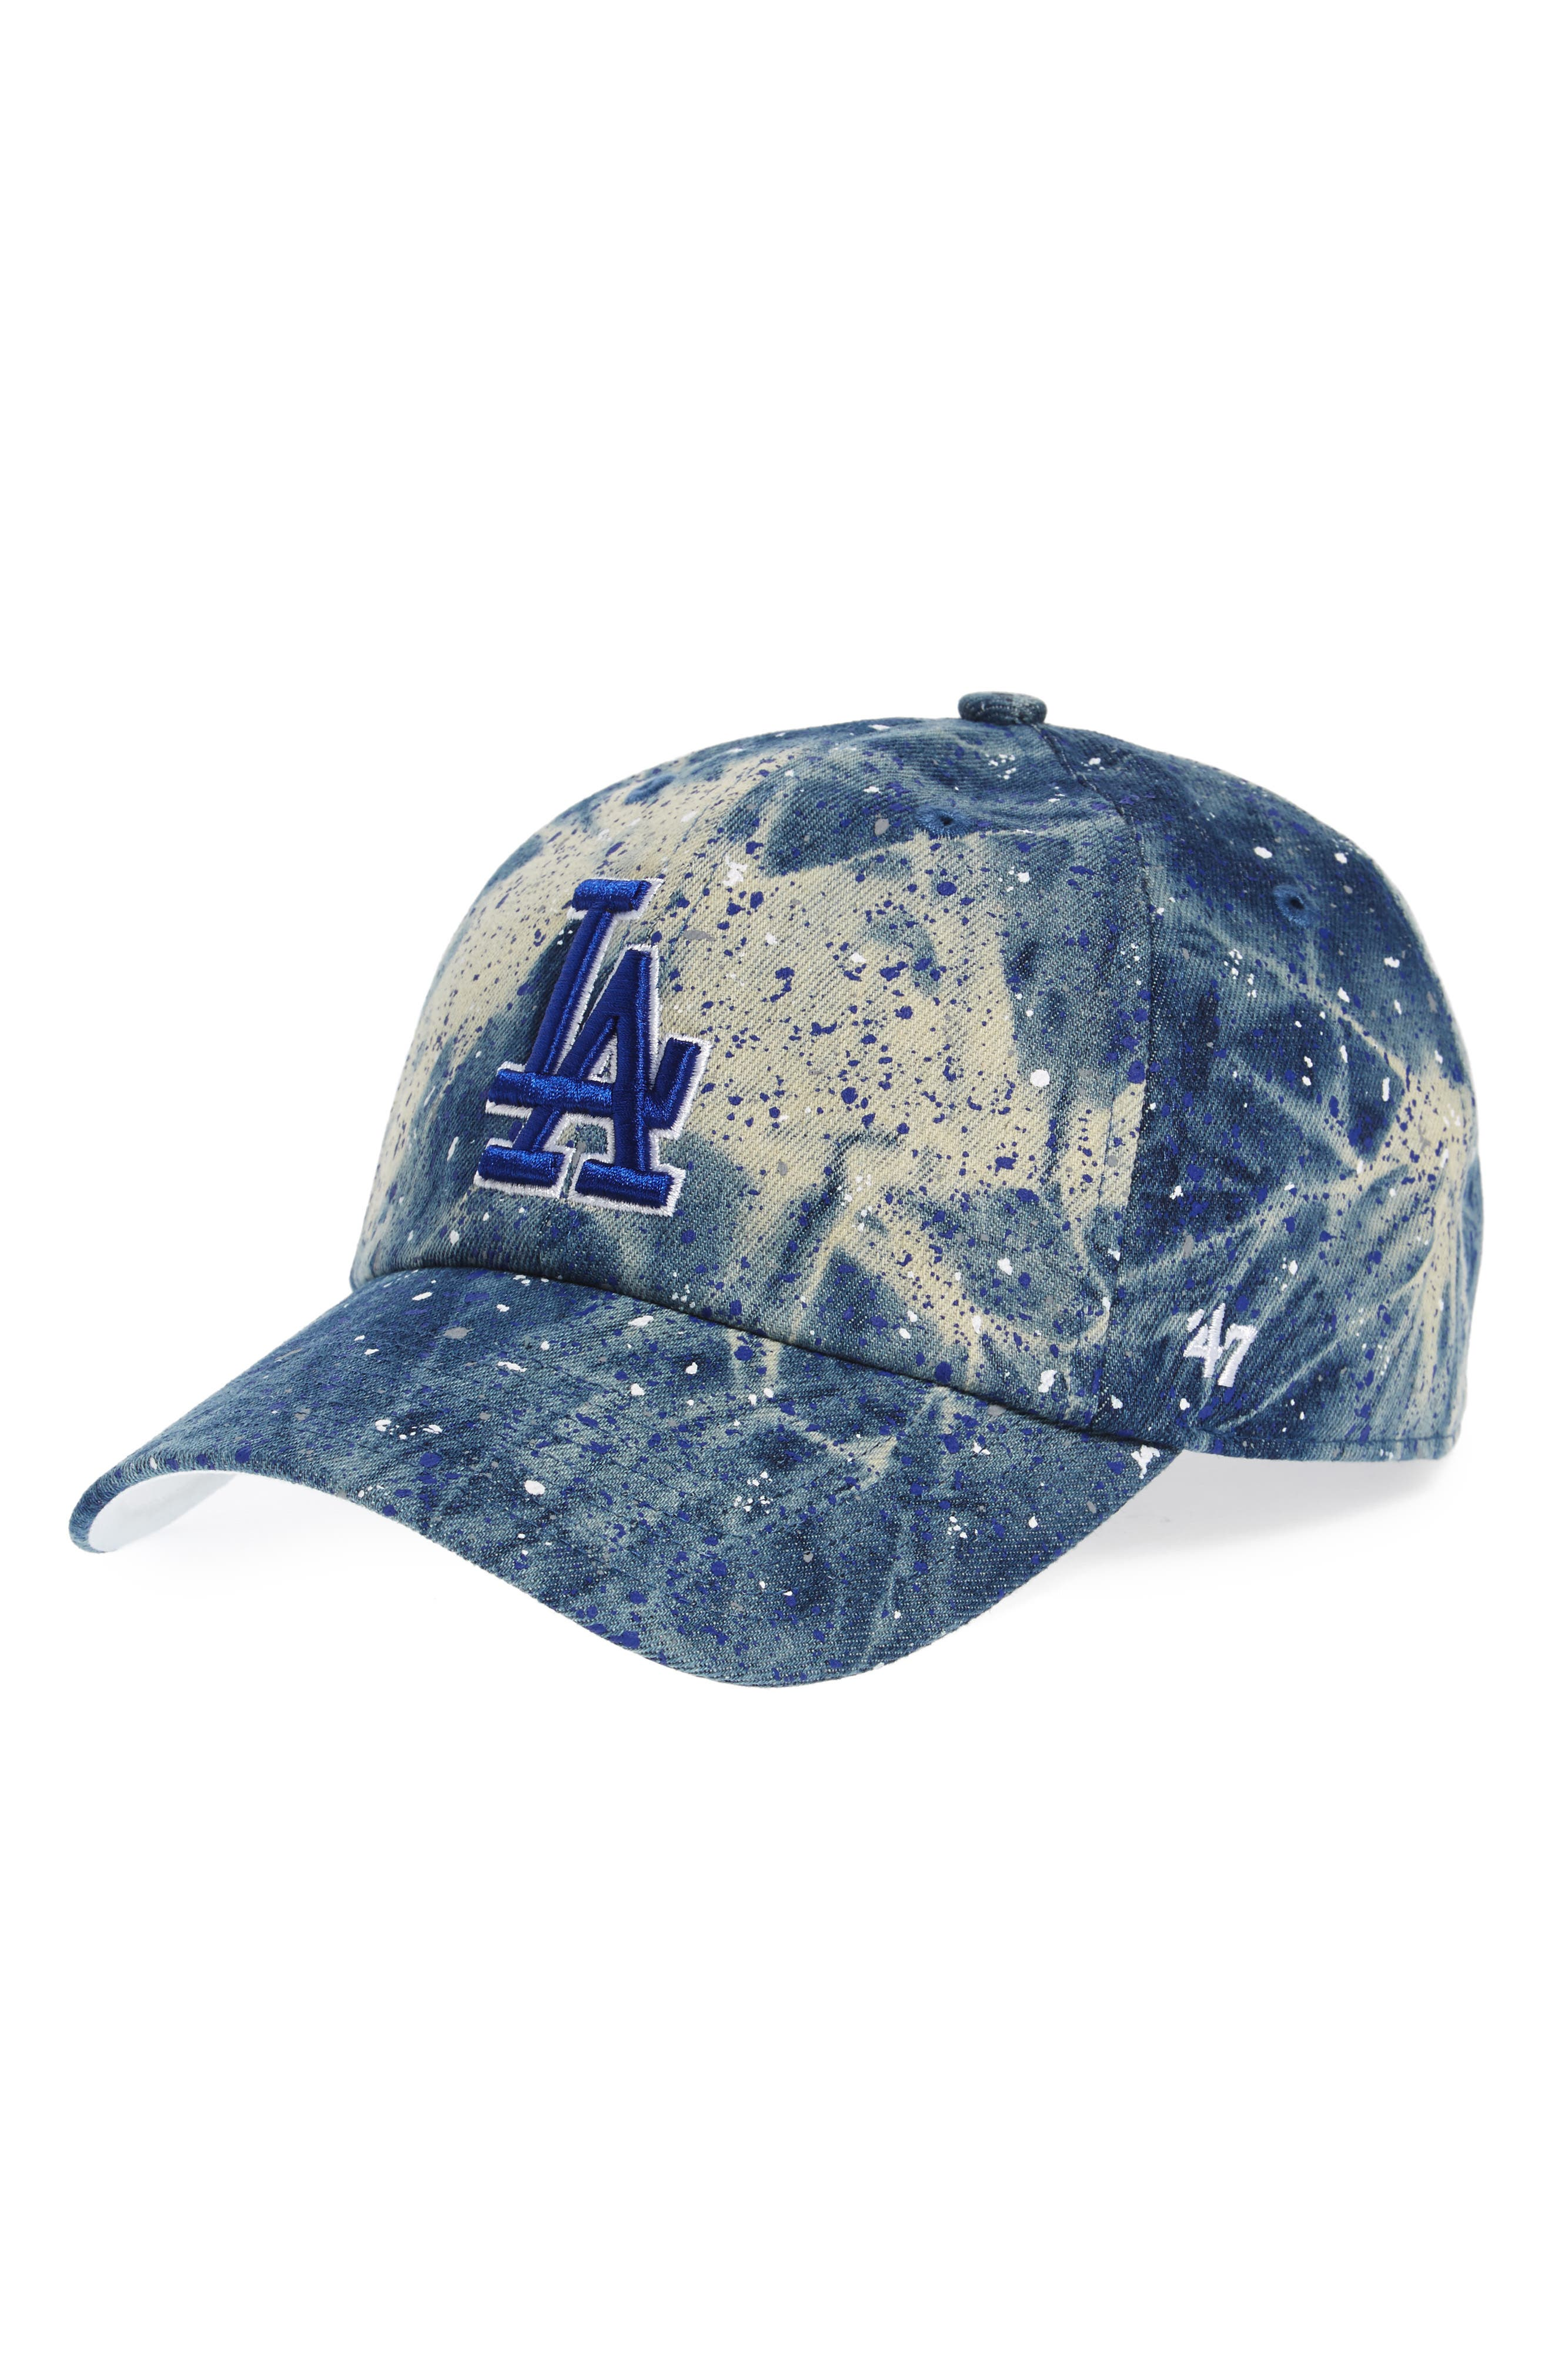 Los Angeles Dodgers - Blue Splatter Baseball Cap,                             Main thumbnail 1, color,                             Blue